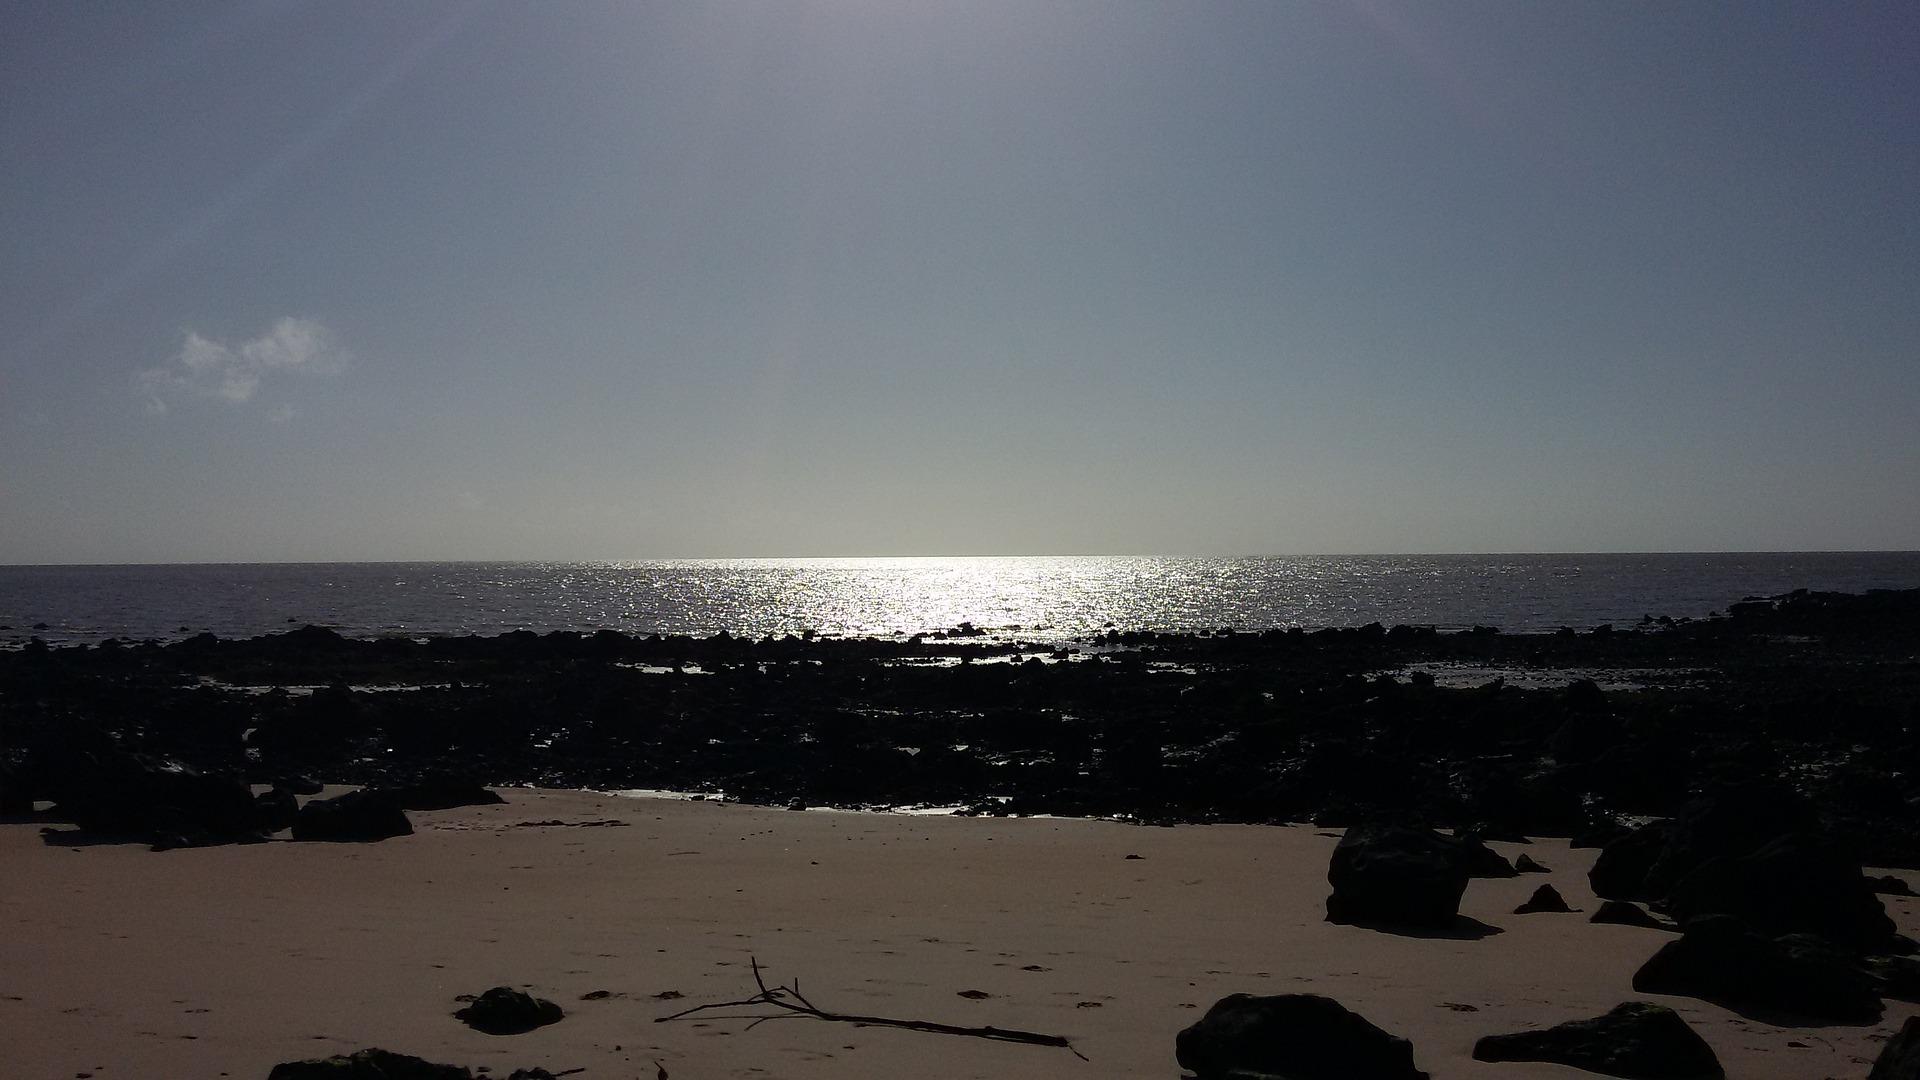 Salvaterra - Pará